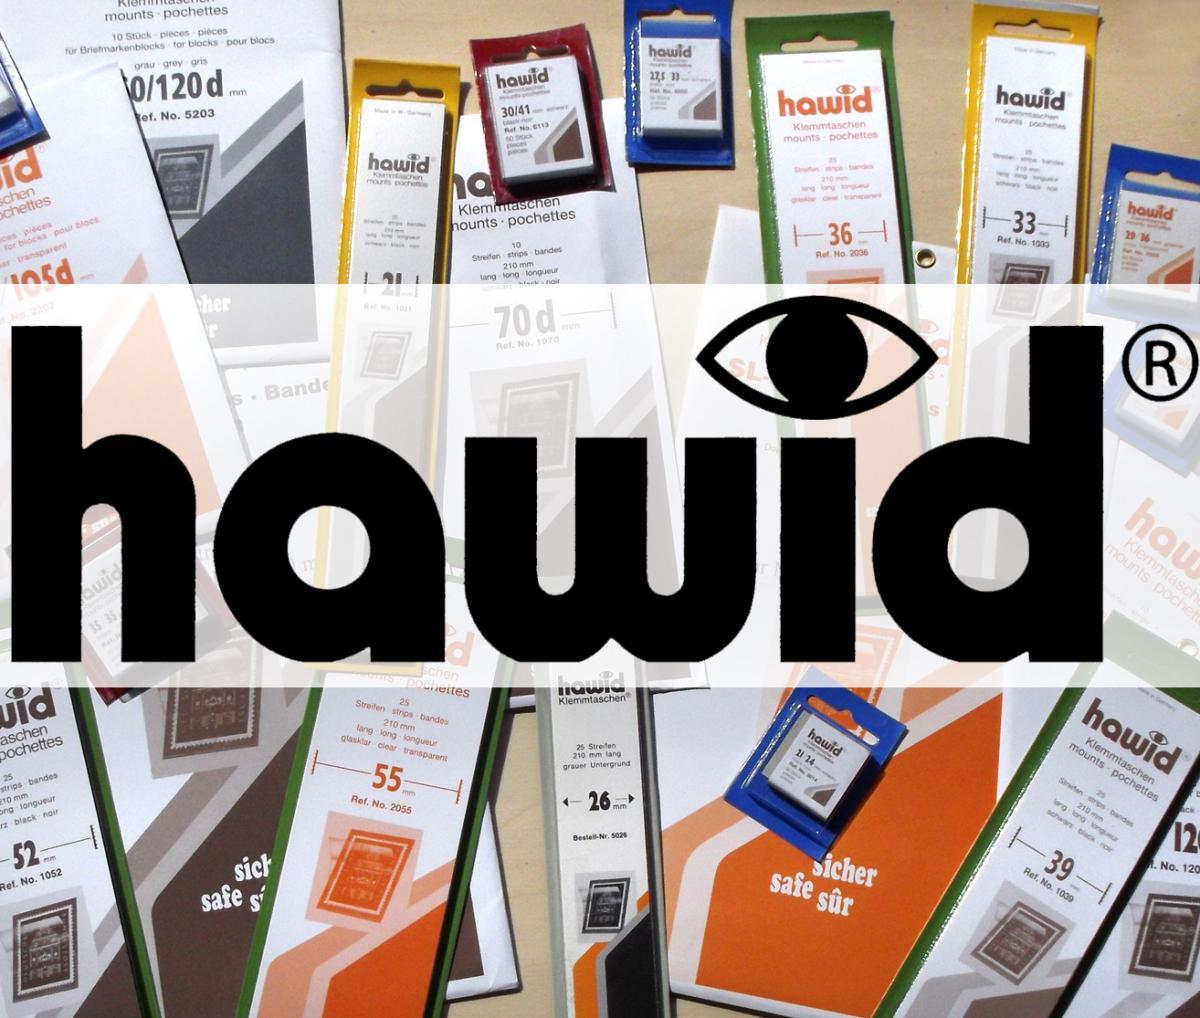 HAWID-Blockstreifen 5204, 210x170 mm, grau, 5er-Pack, d* 0